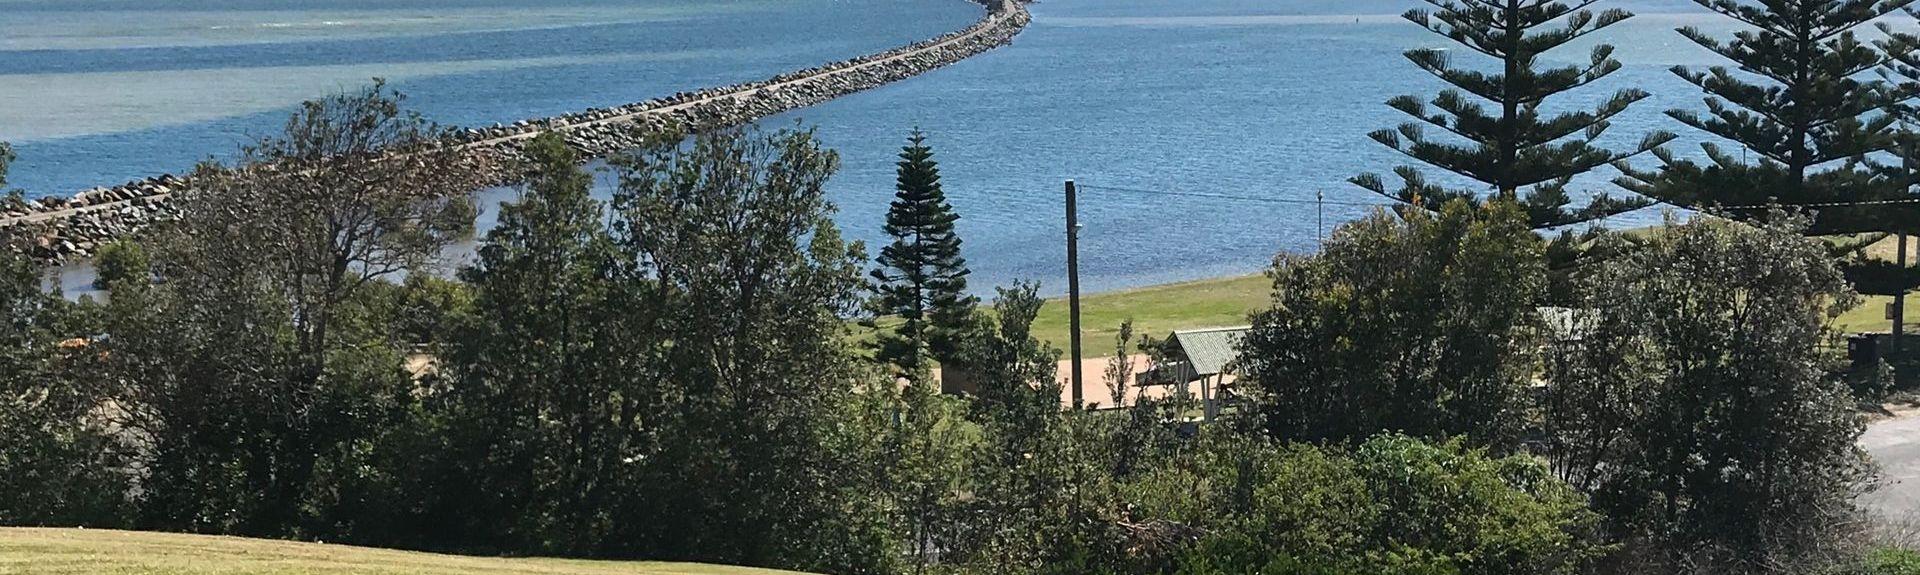 Queen Elizabeth Park, Taree, New South Wales, Australia